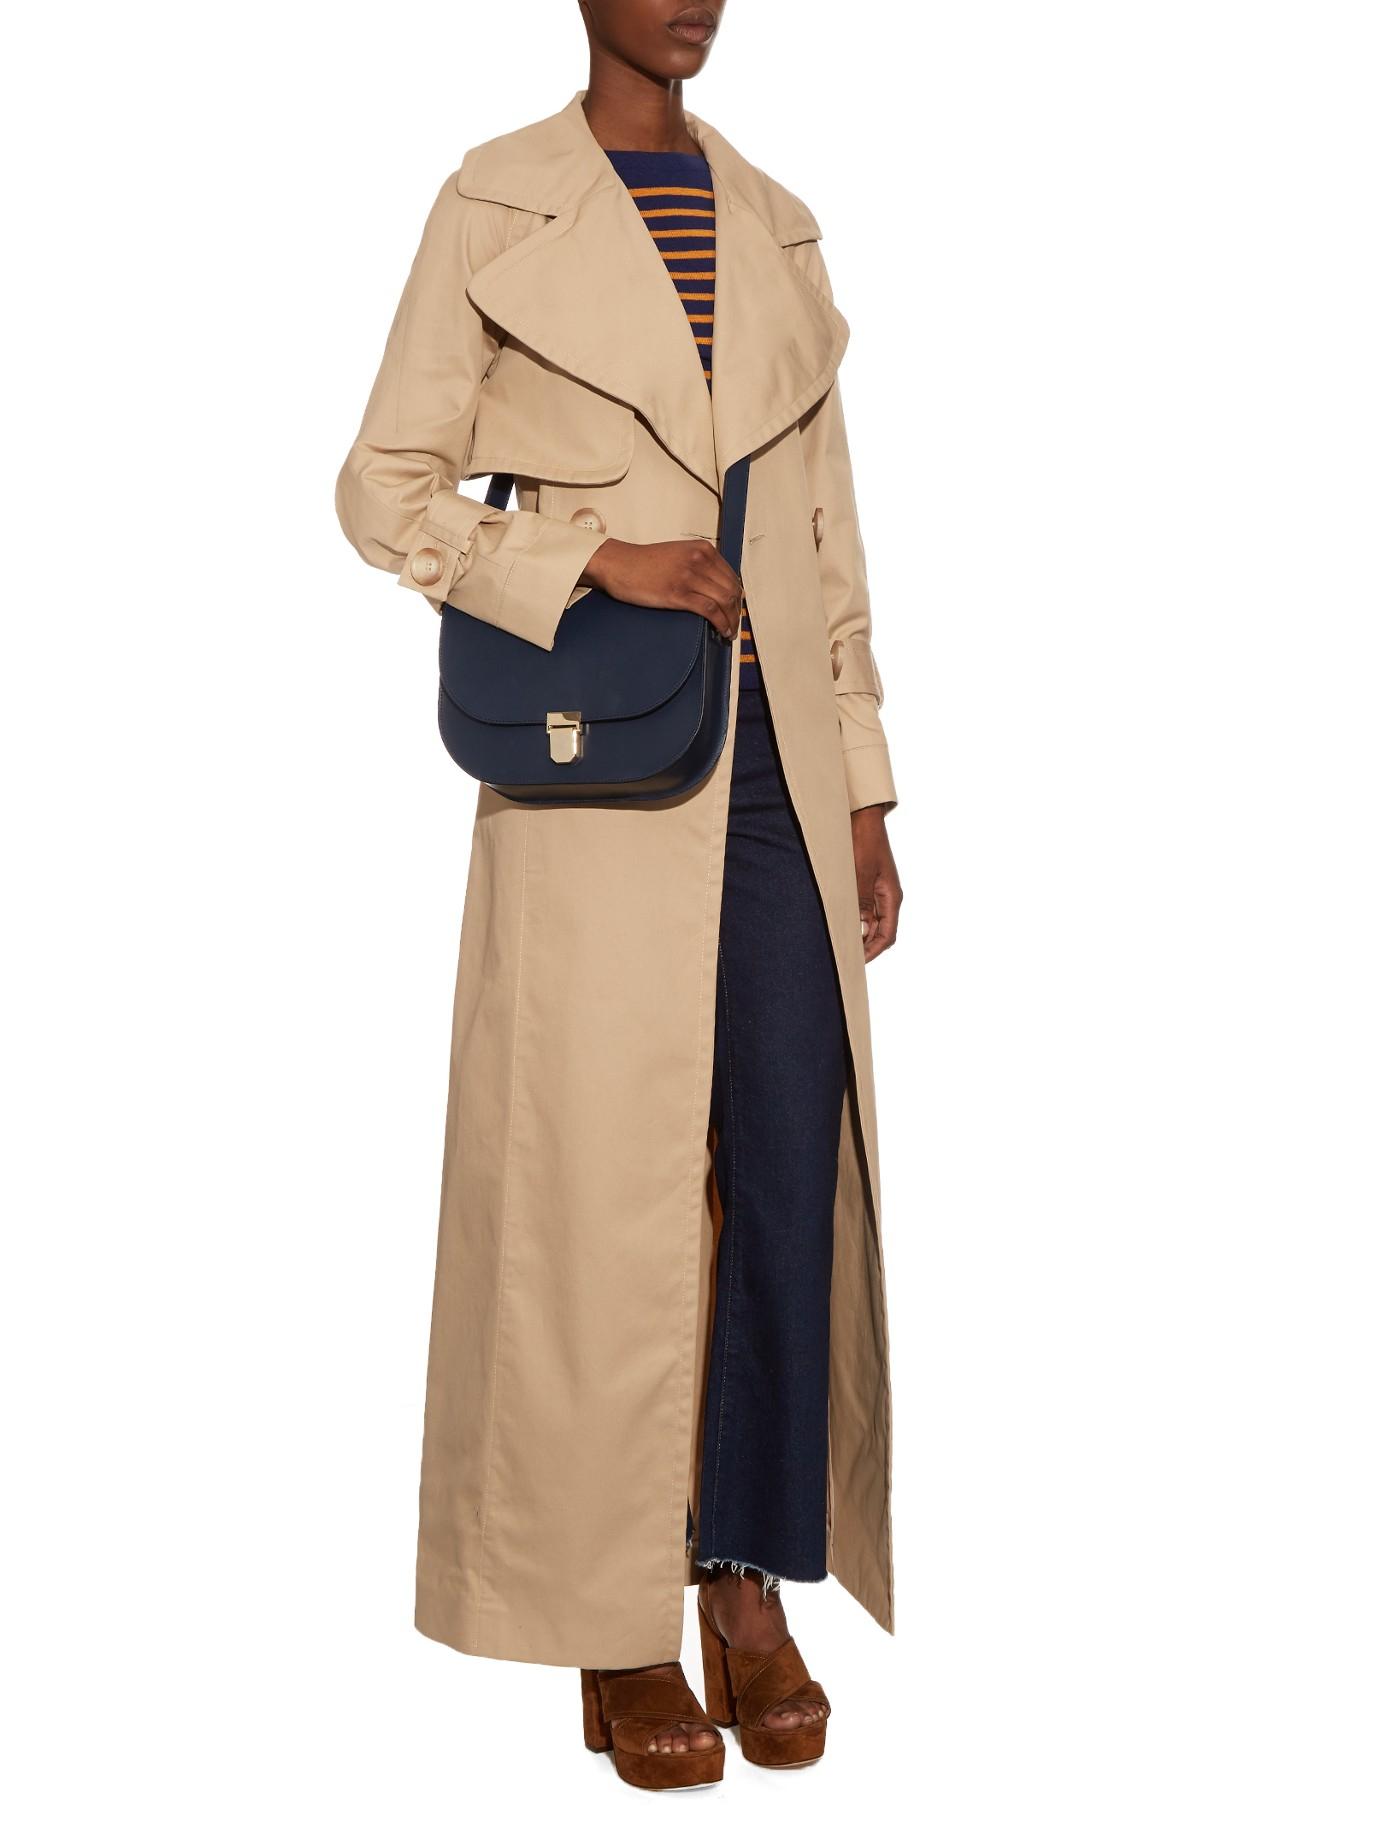 b9a2985b85 Lyst - A.P.C. Vienne Leather Satchel Cross-body Bag in Blue